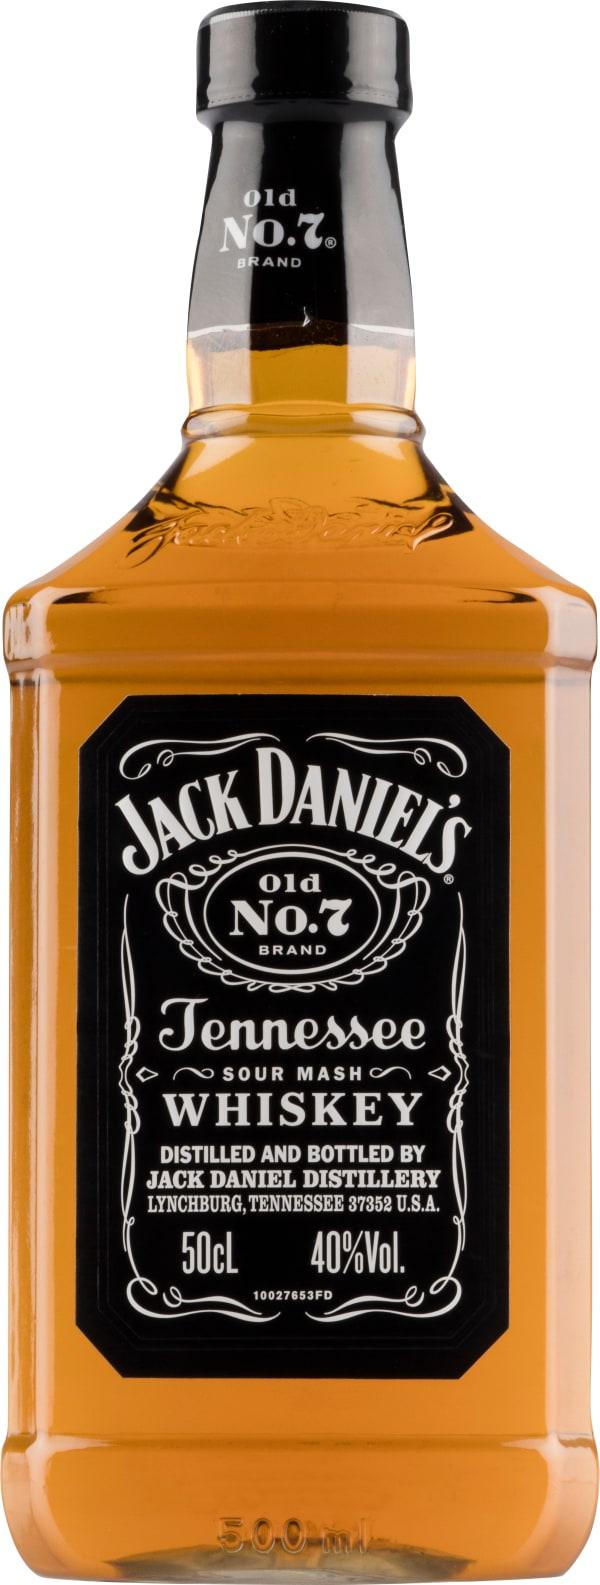 Jack Daniel's Old No. 7 plastflaska